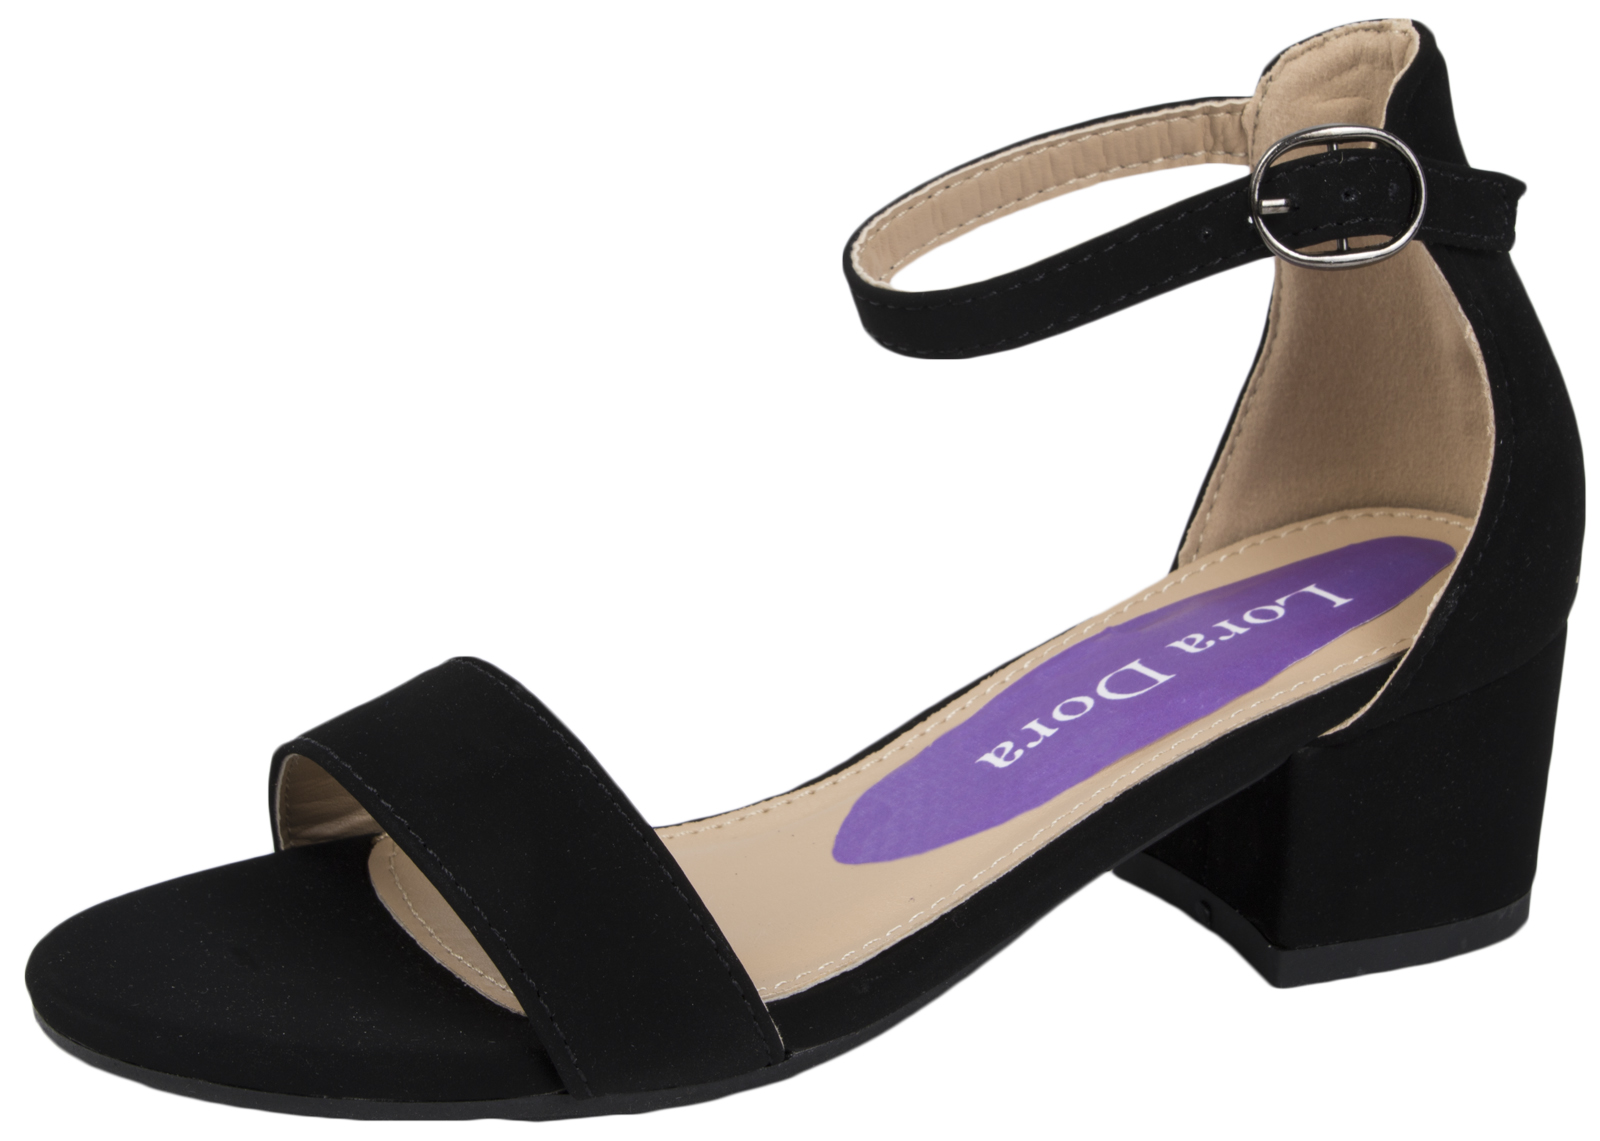 Kids Girls Low Block Heel Party Shoes Faux Suede ...